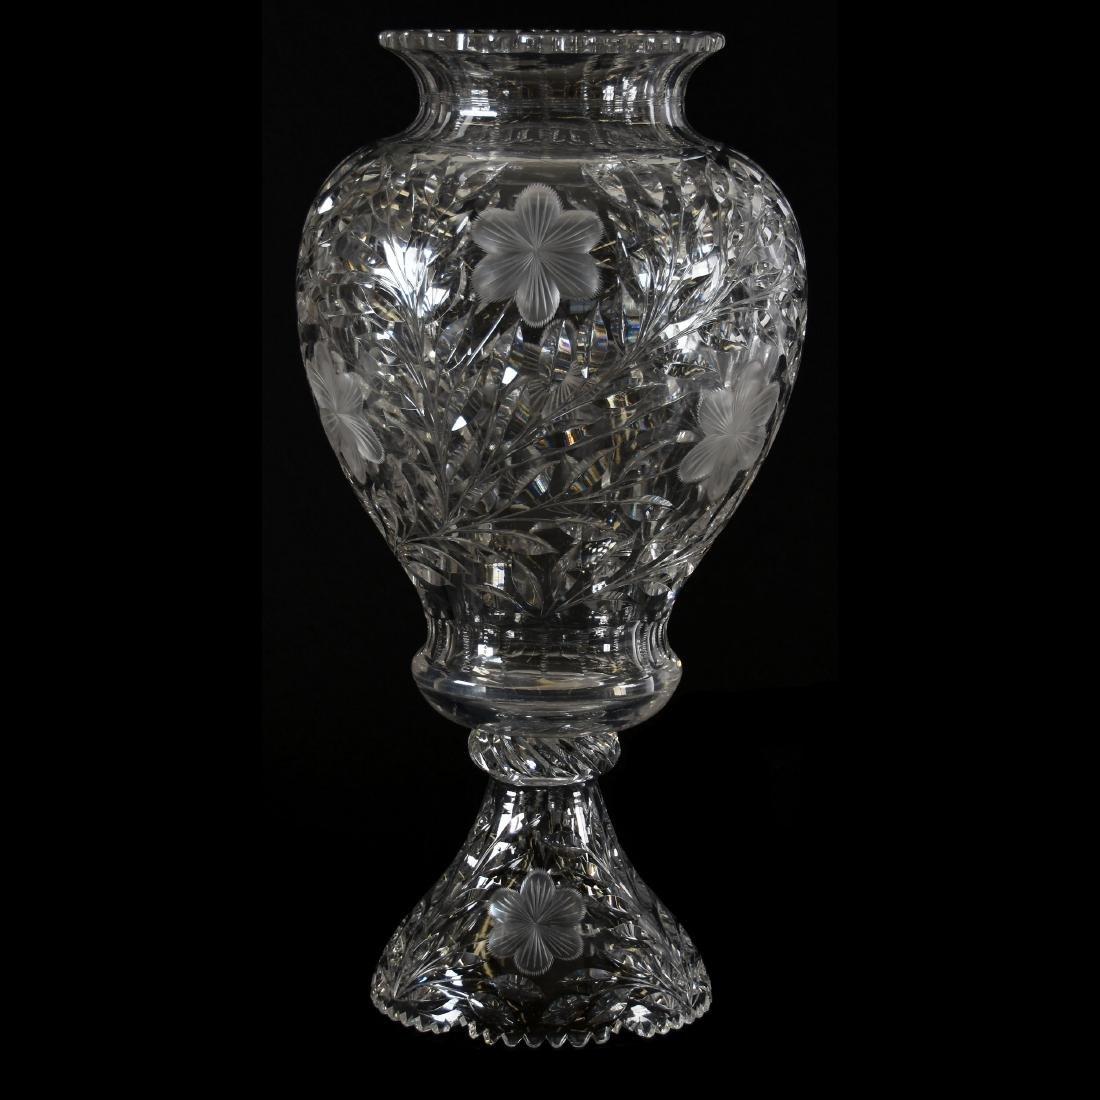 Two-Part Vase, Engraved Floral Motif